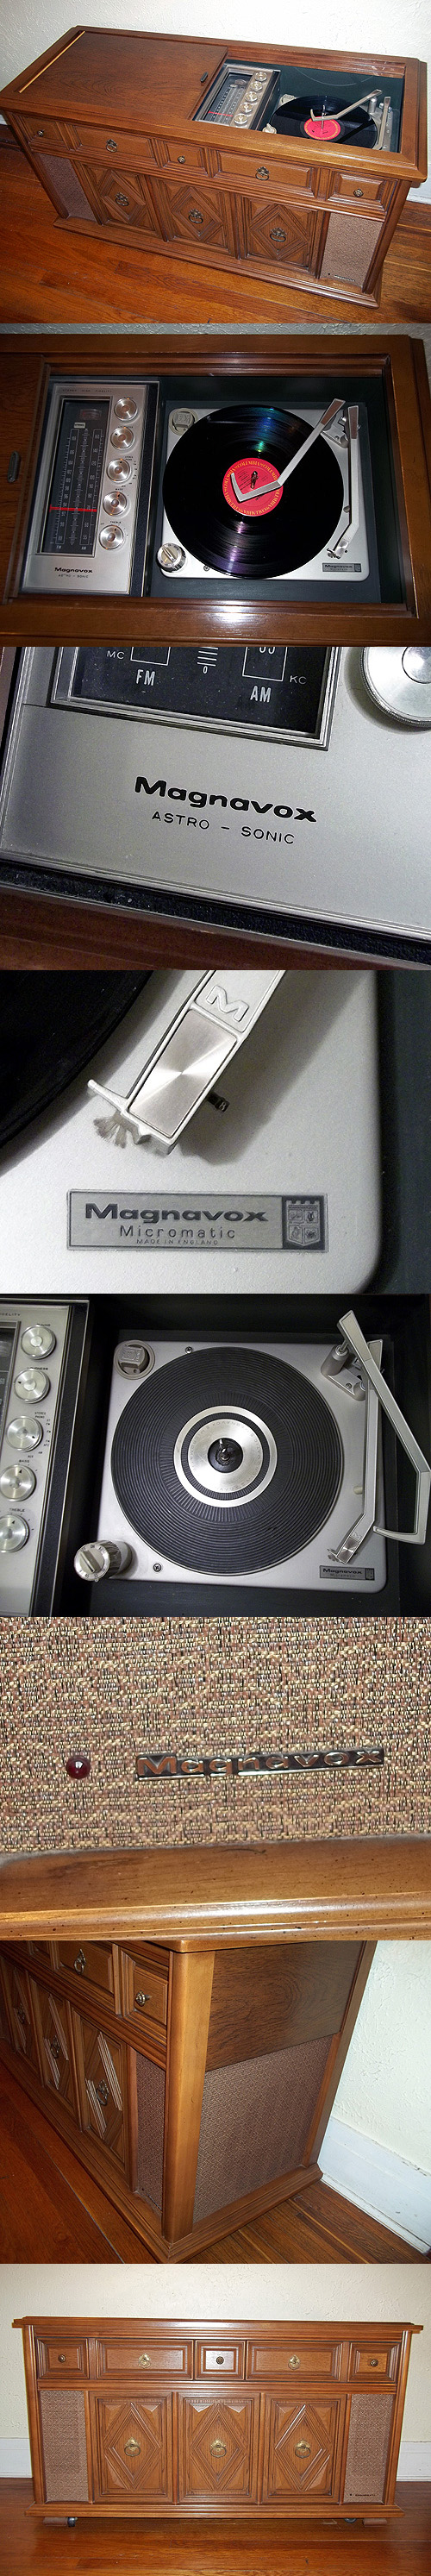 Sold Vtg 1968 Magnavox Astro Sonic Stereo Console Model